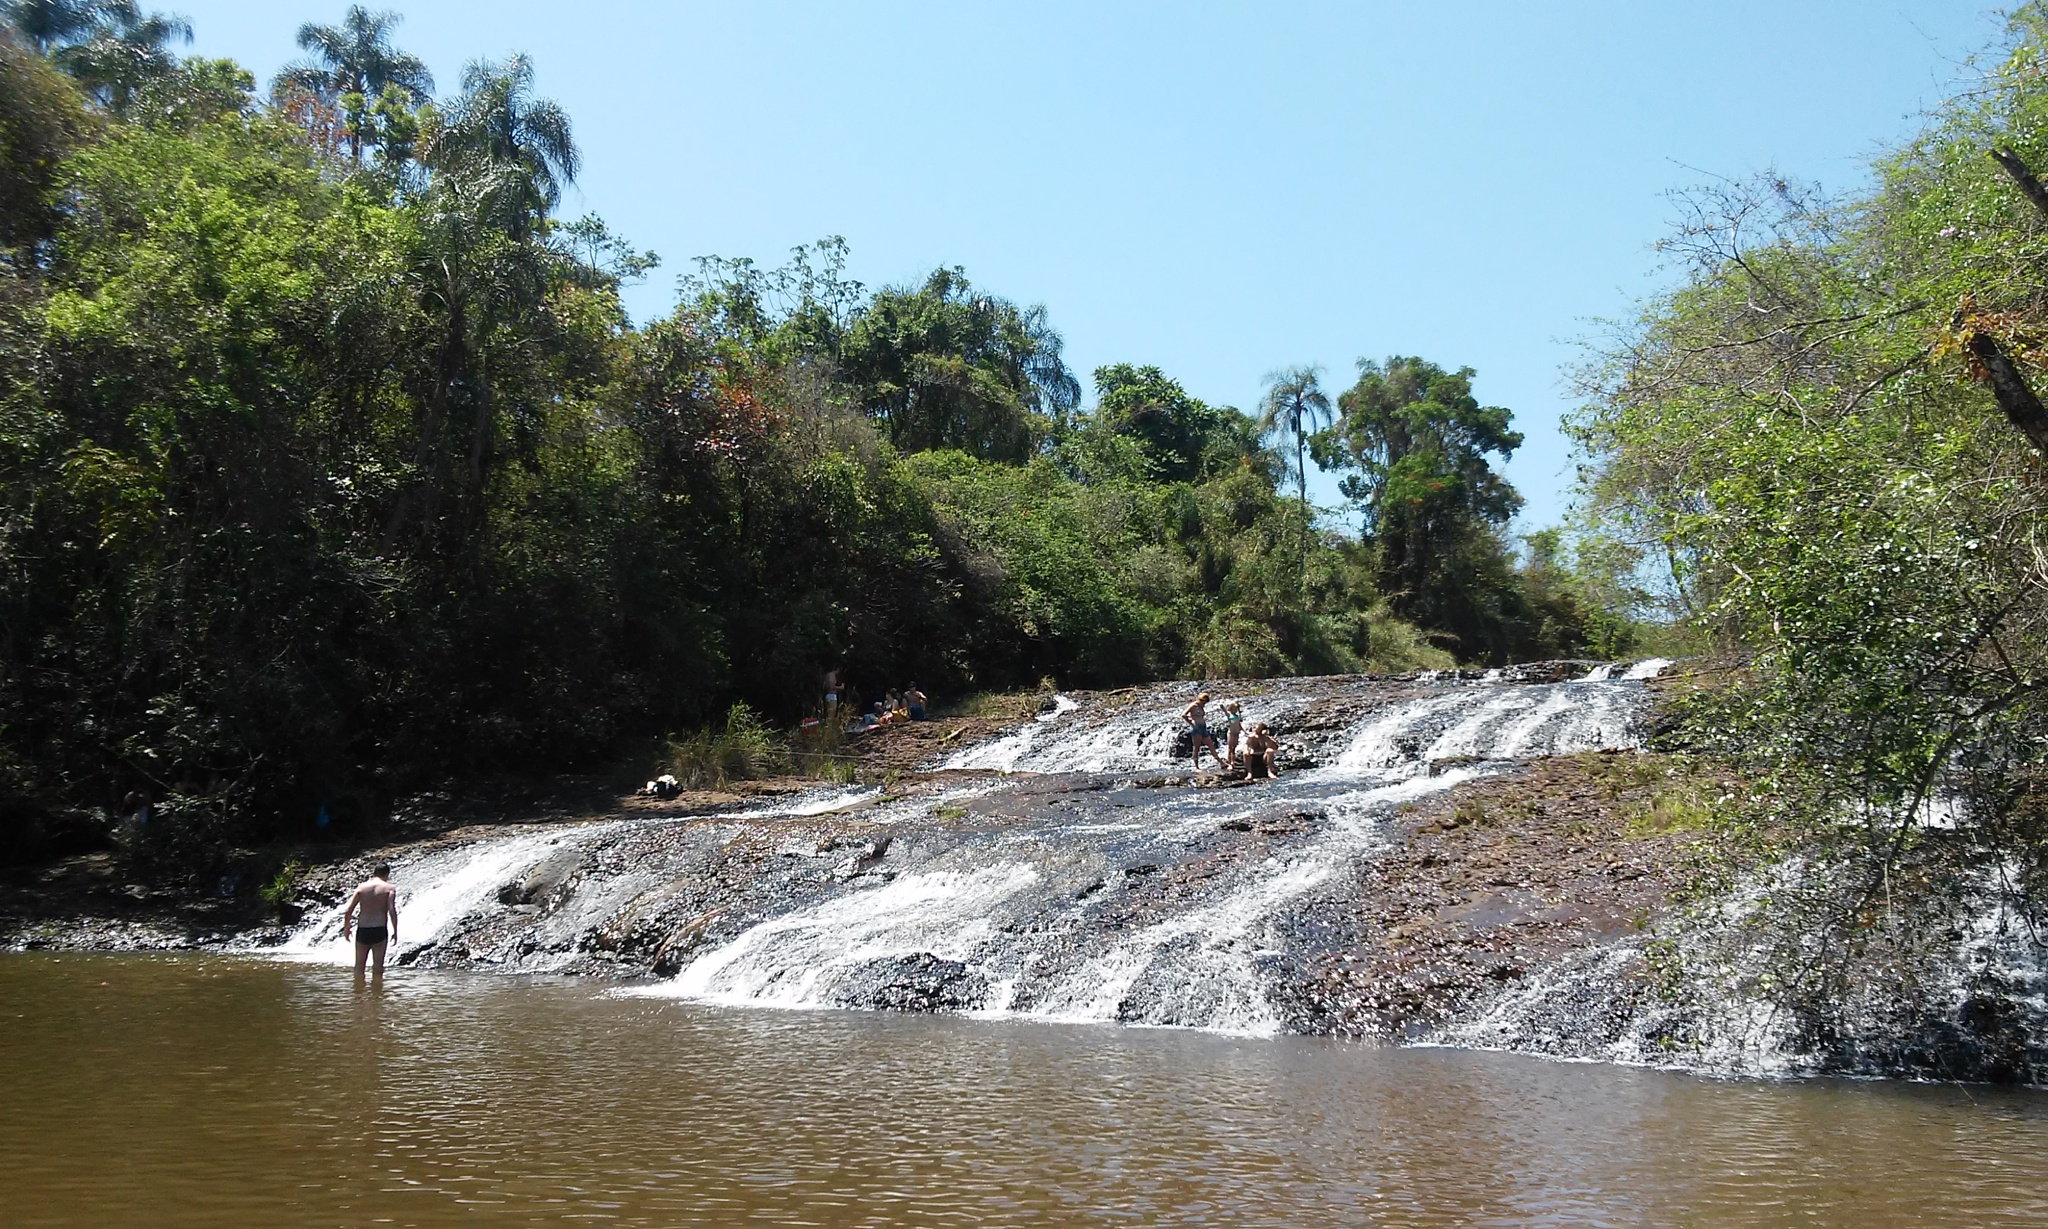 Cachoeira Escorregador / Waterfall in Brotas / SP by Hakan Somali